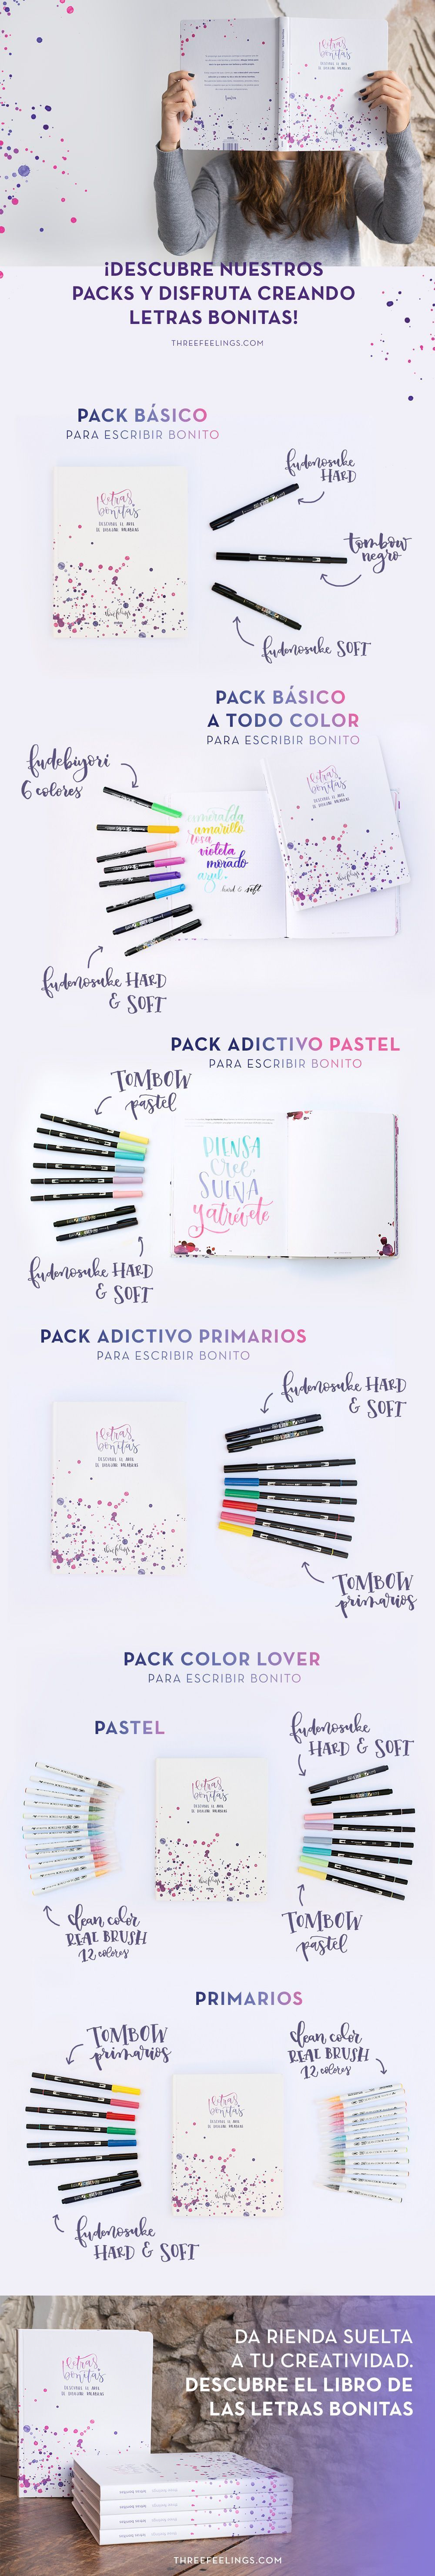 pack-letrasbonitas-infografia3-ok